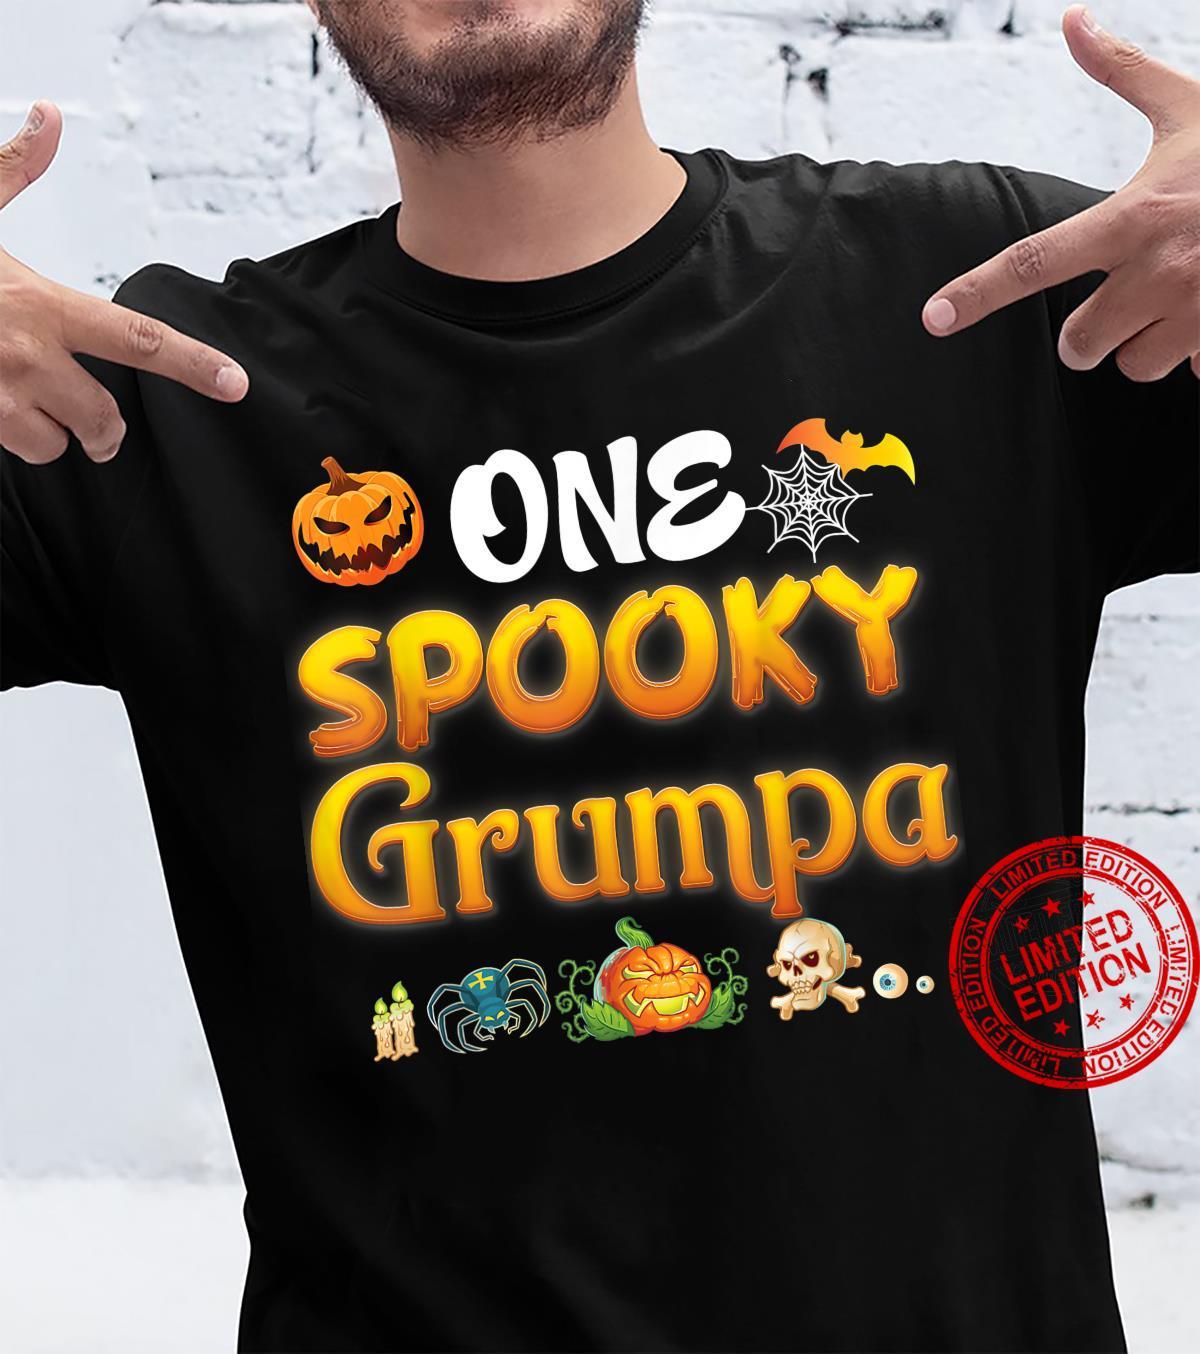 One Spooky Grumpa Scary Pumpkin Horor Halloween Ghost Creepy Shirt